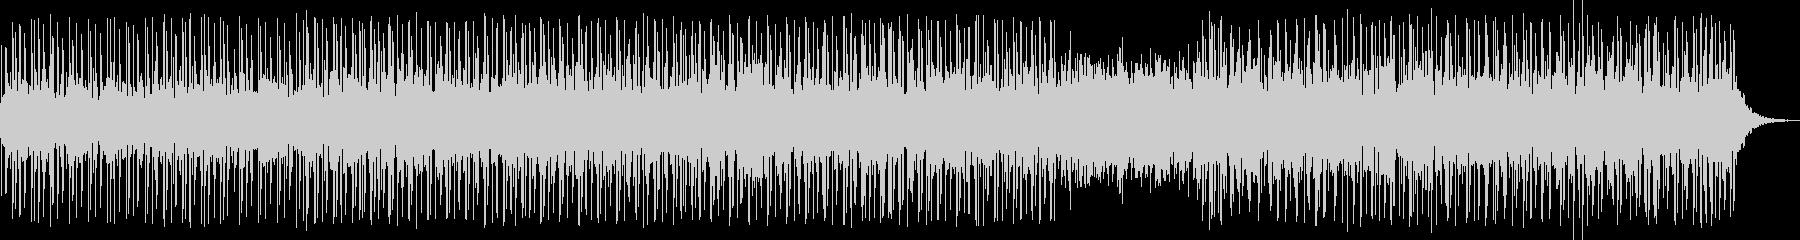 enordの未再生の波形